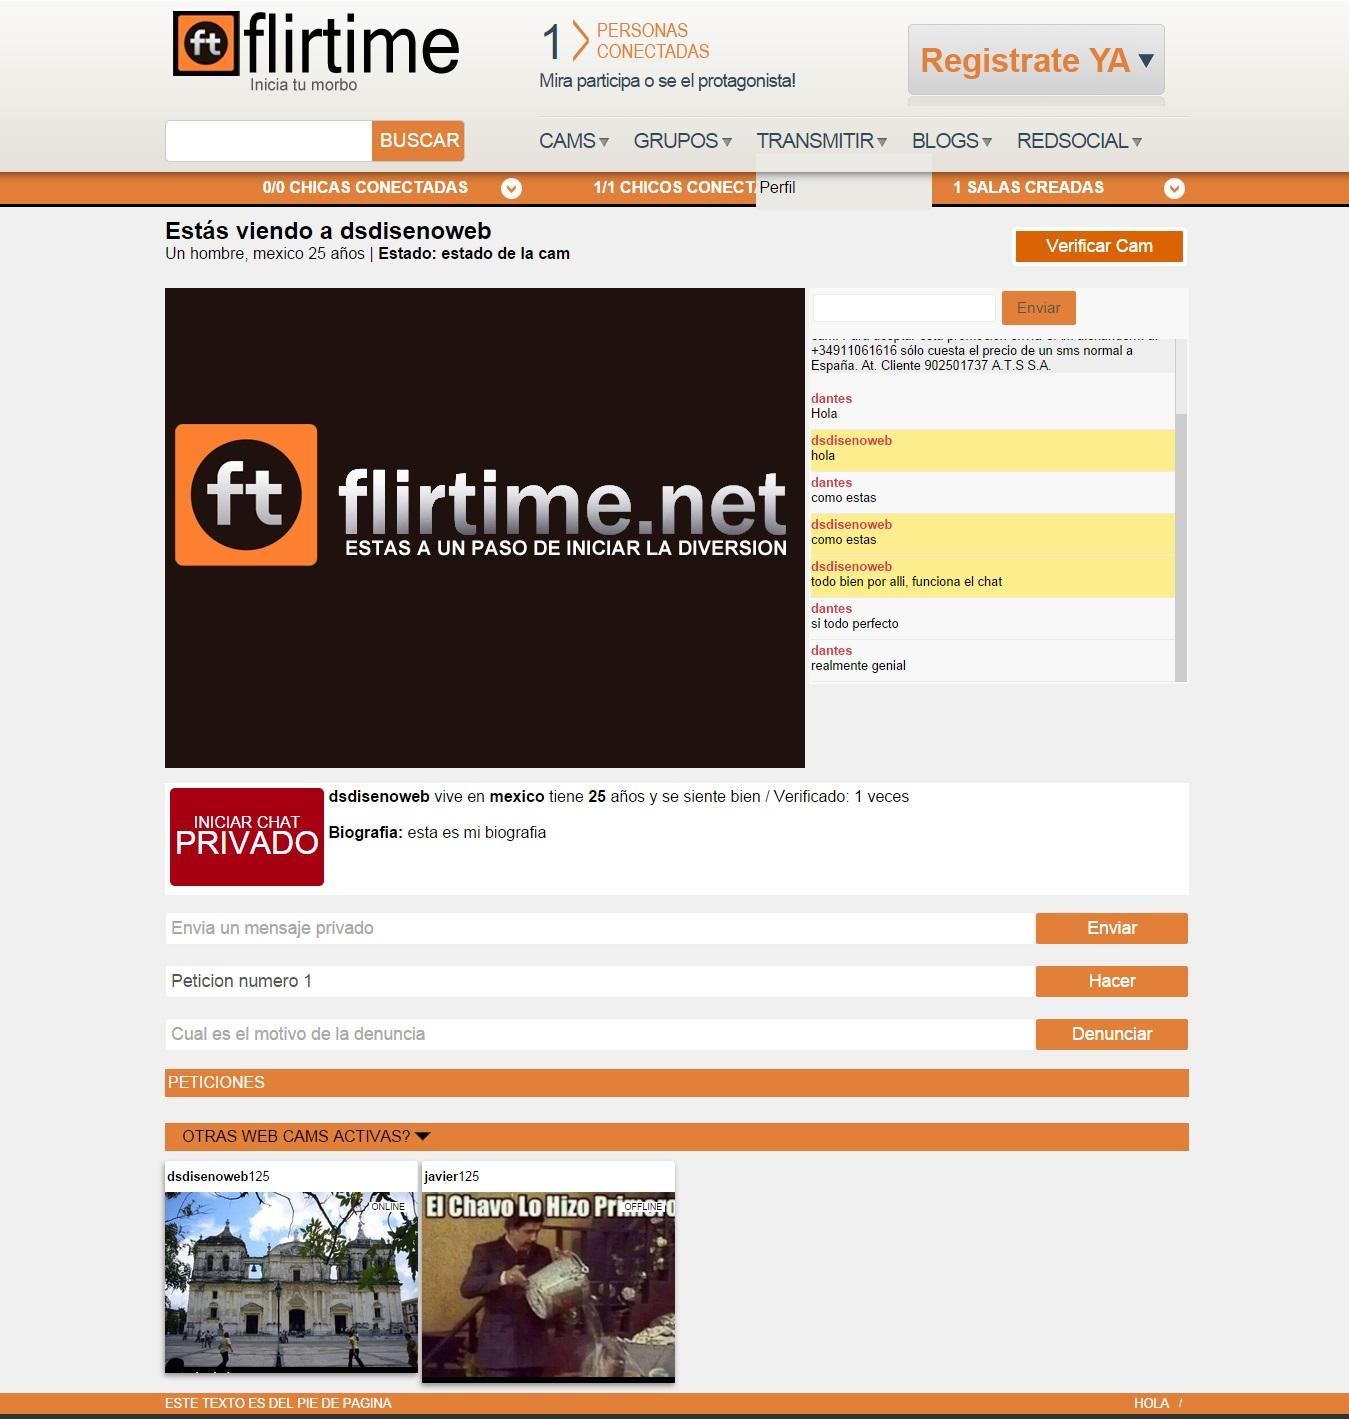 flirtime.net usuario.php usuario dsdisenoweb 2